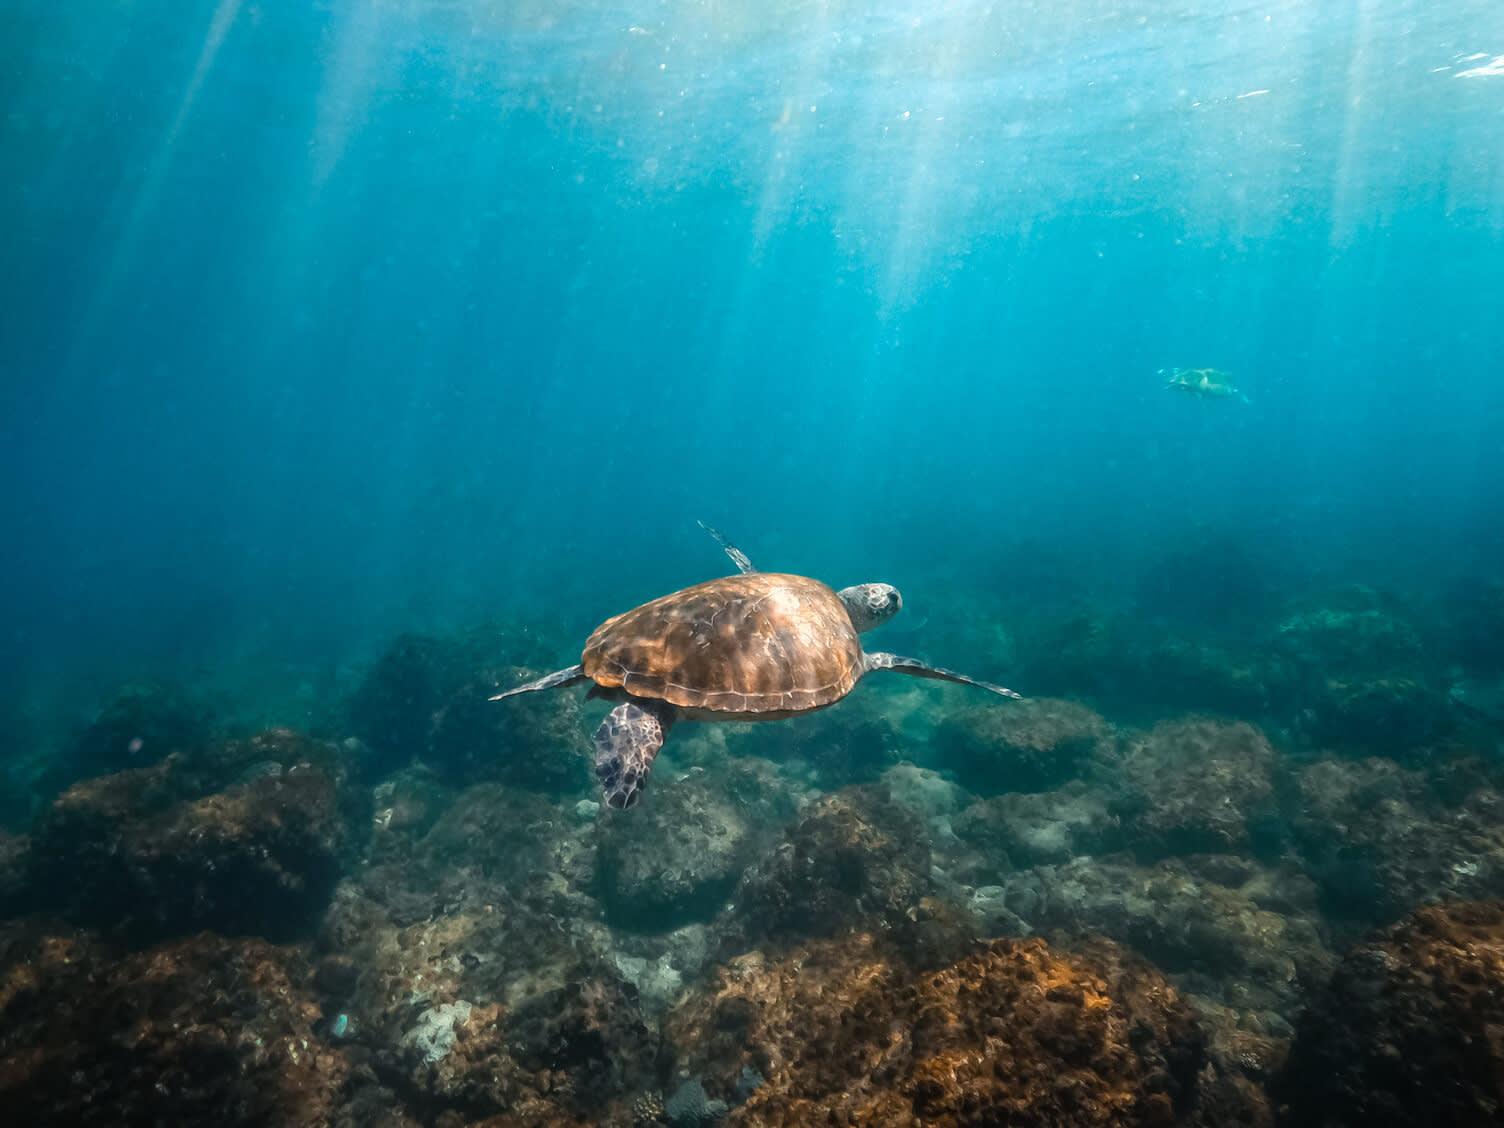 Snorkelling at Old Woman/ Mudjimba Island with Sunreef